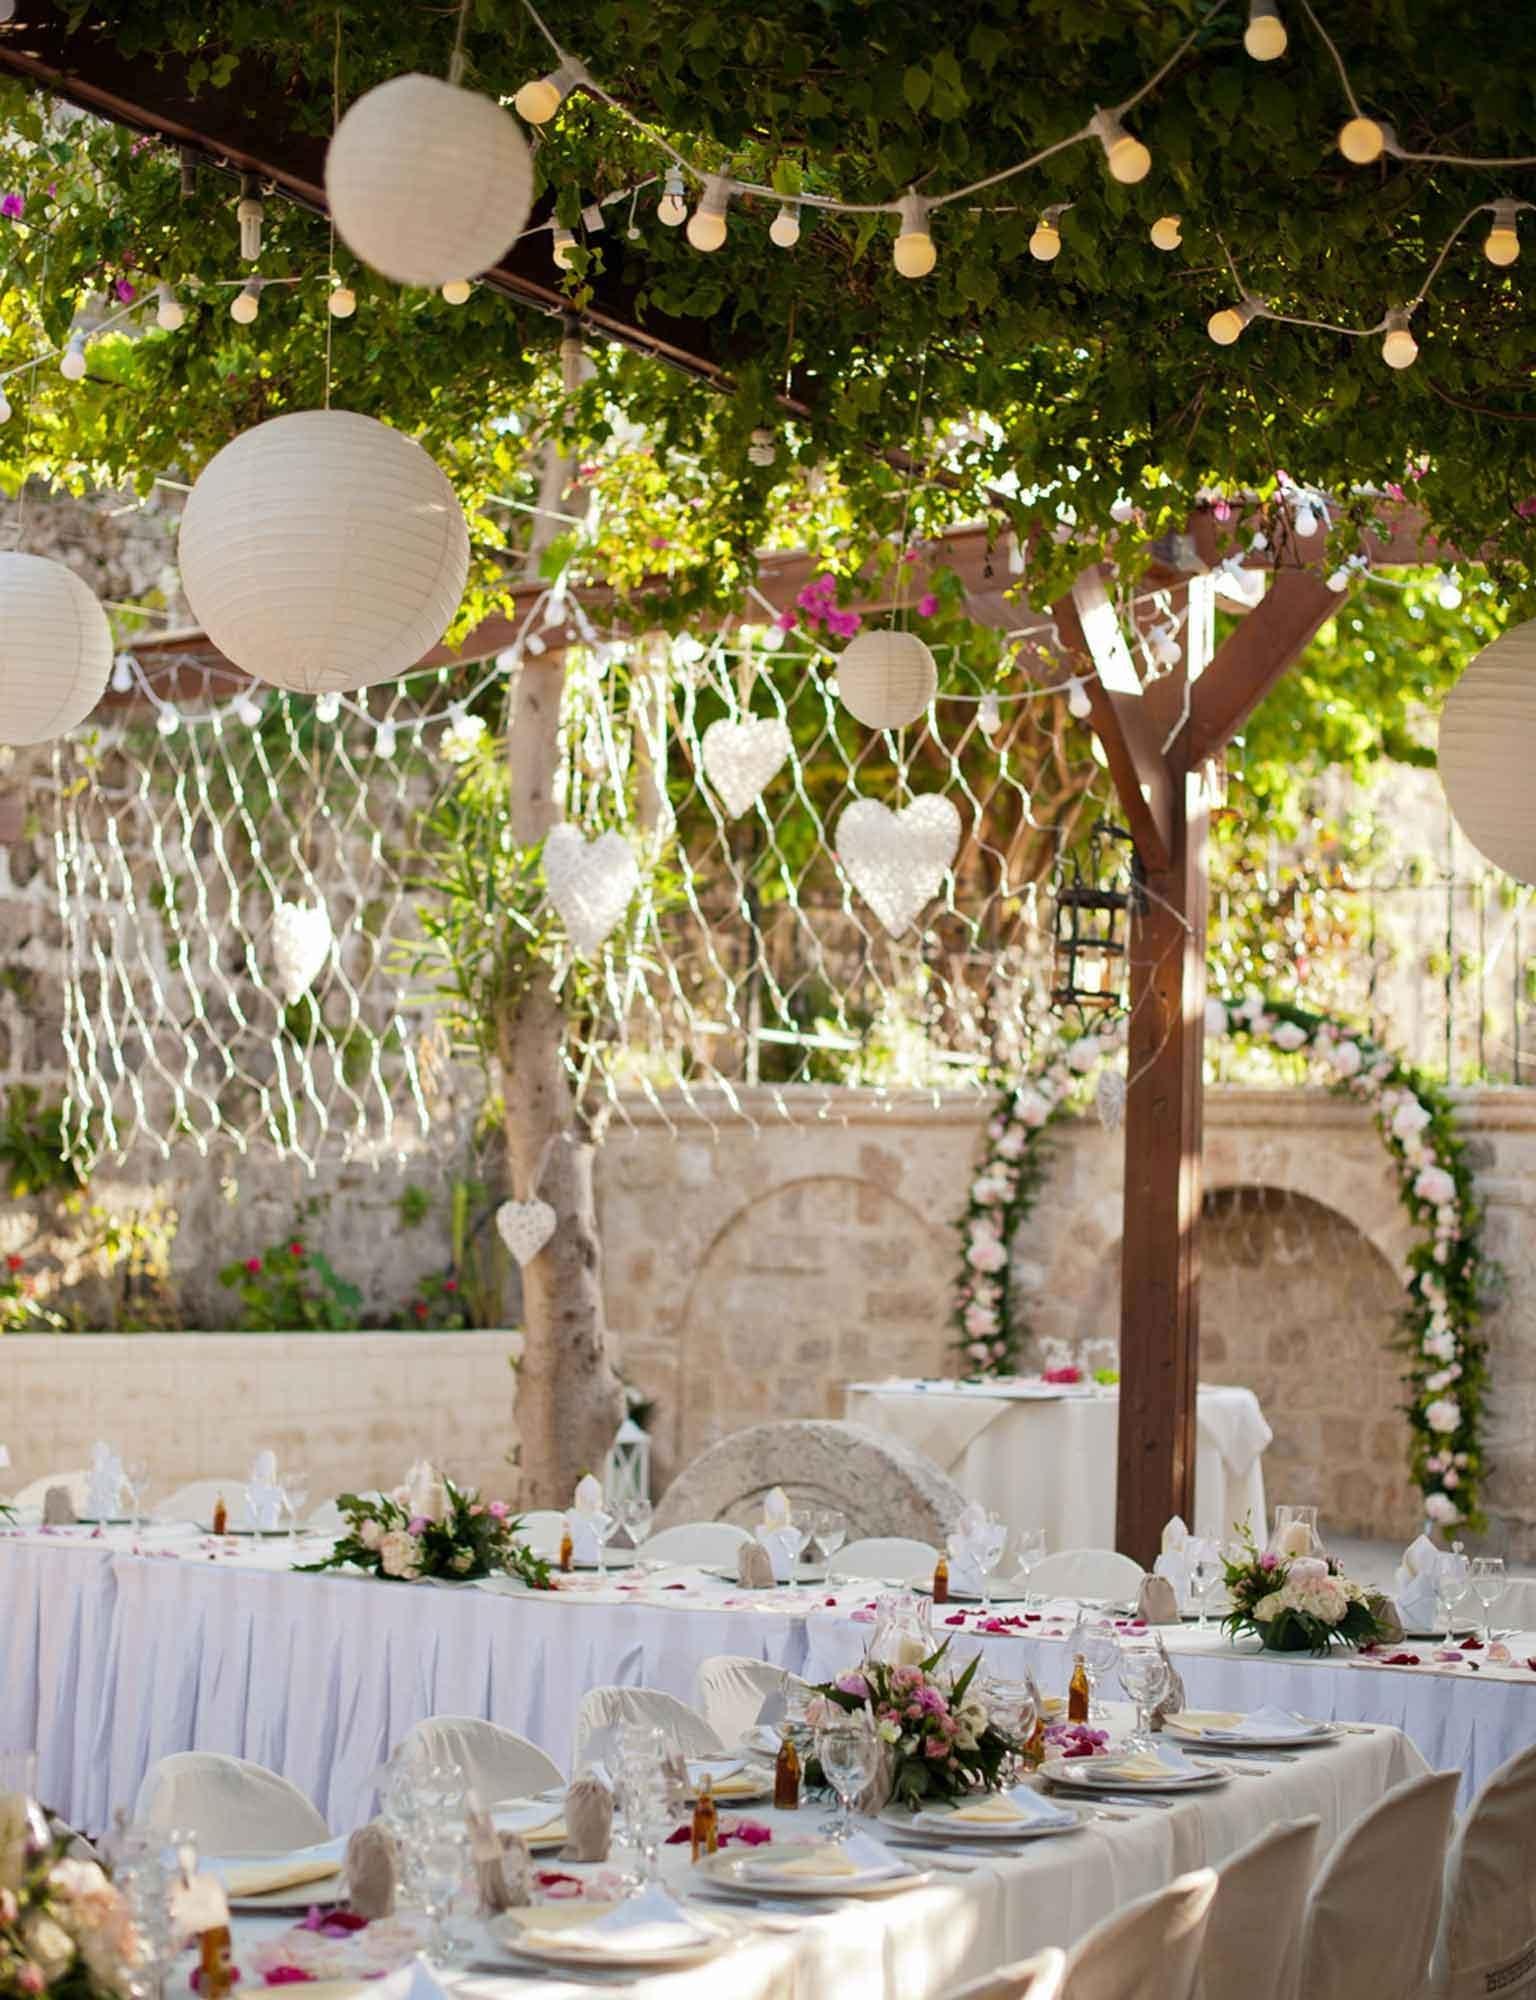 Wedding Light Ideas (View 11 of 20)